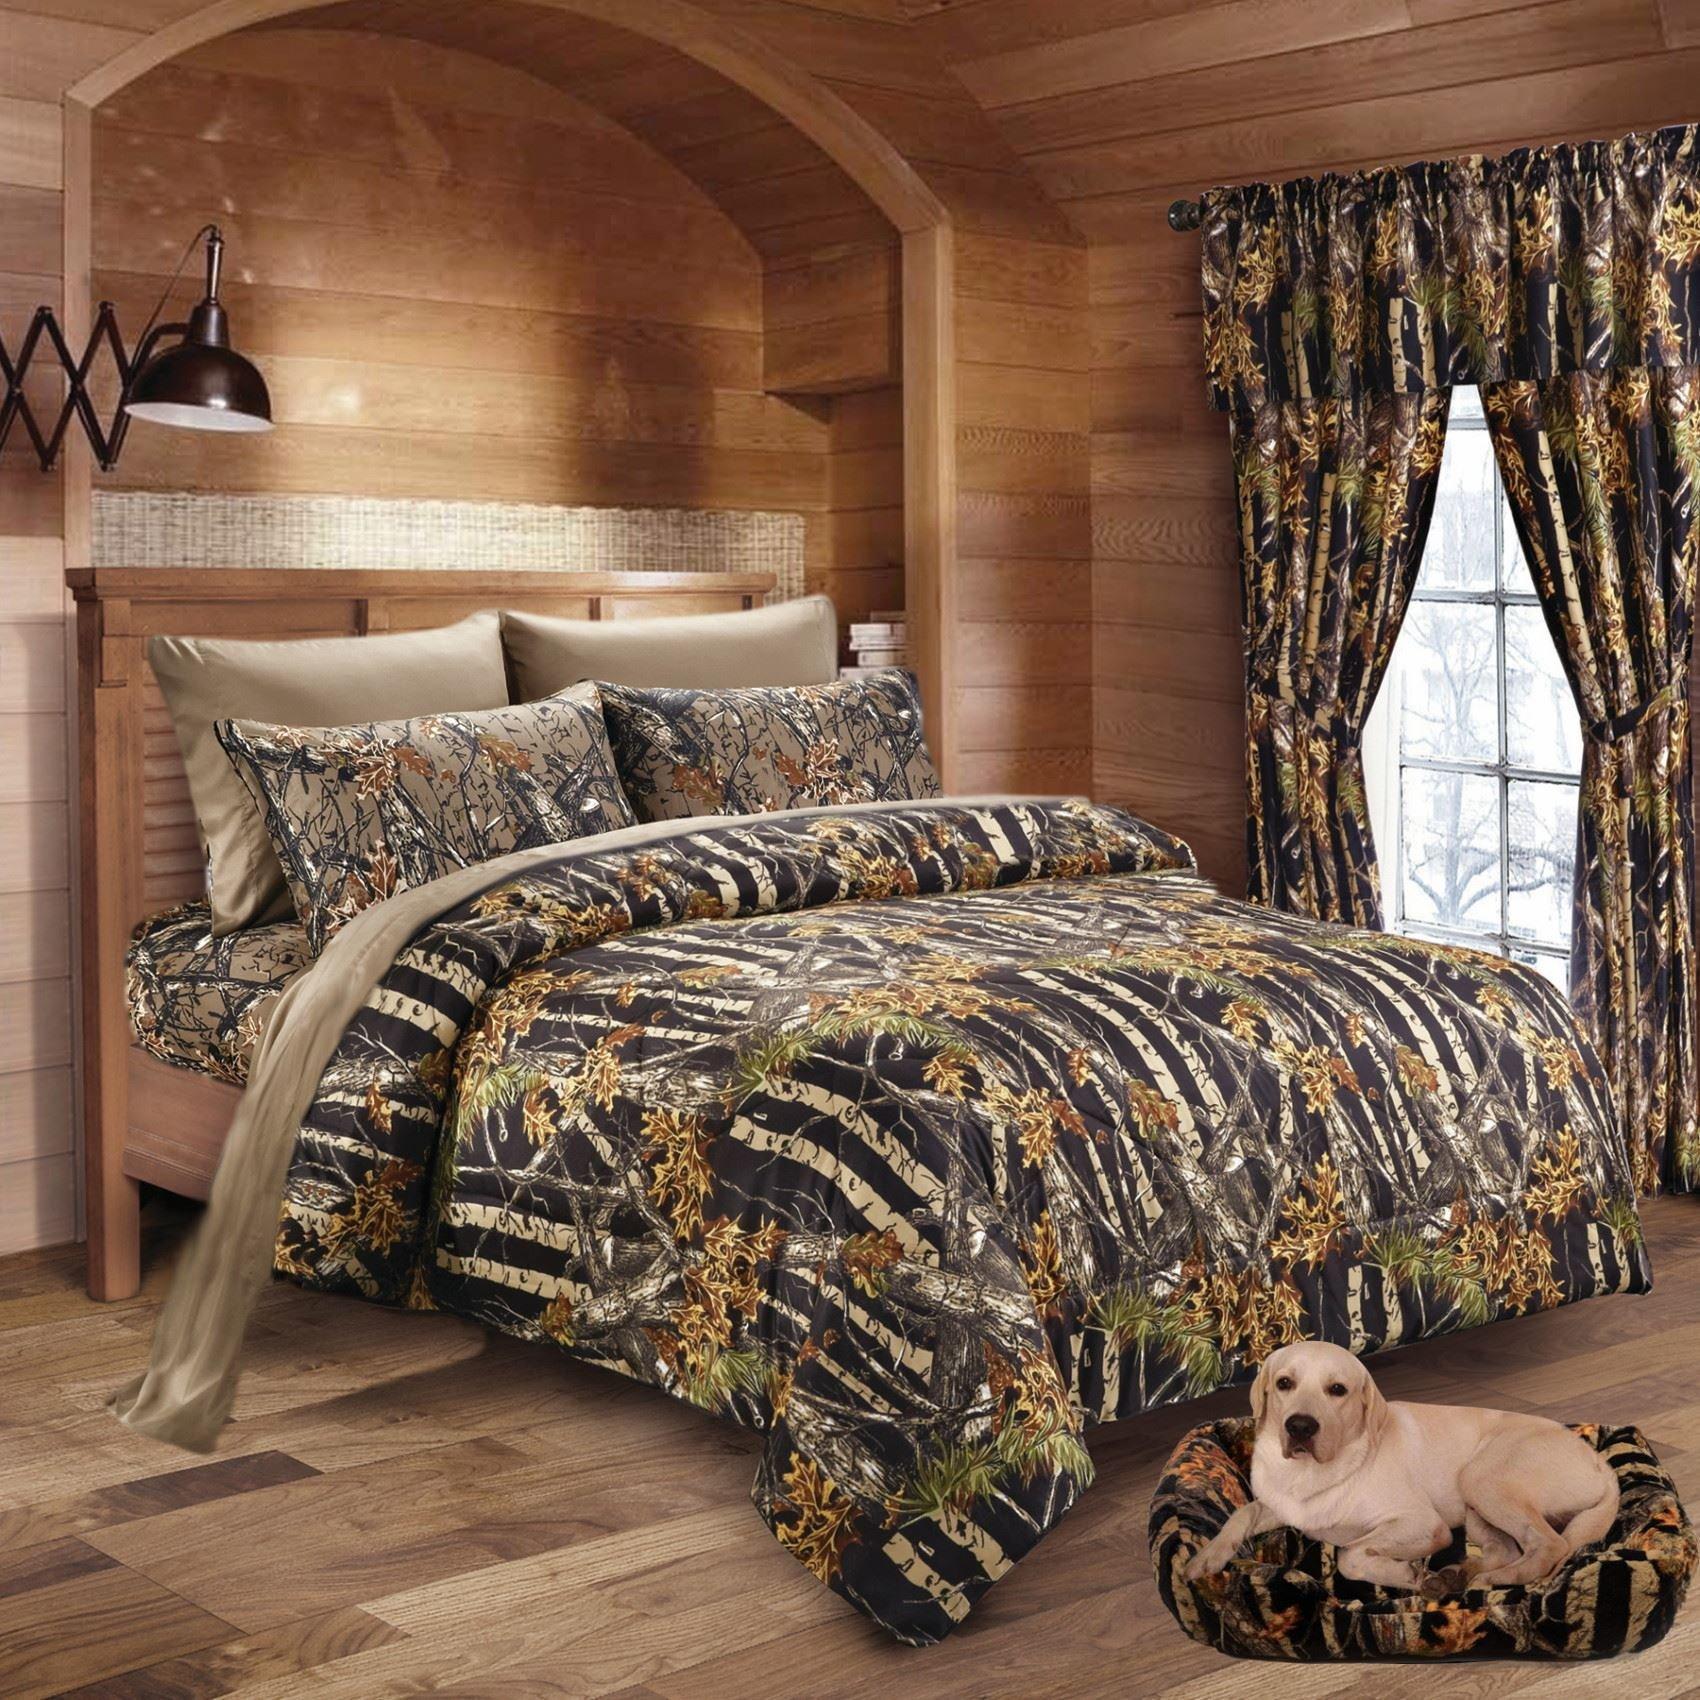 20 Lakes Woodland Hunter Camo Comforter, Sheet, Pillowcase Set (Twin, Black & Forest)